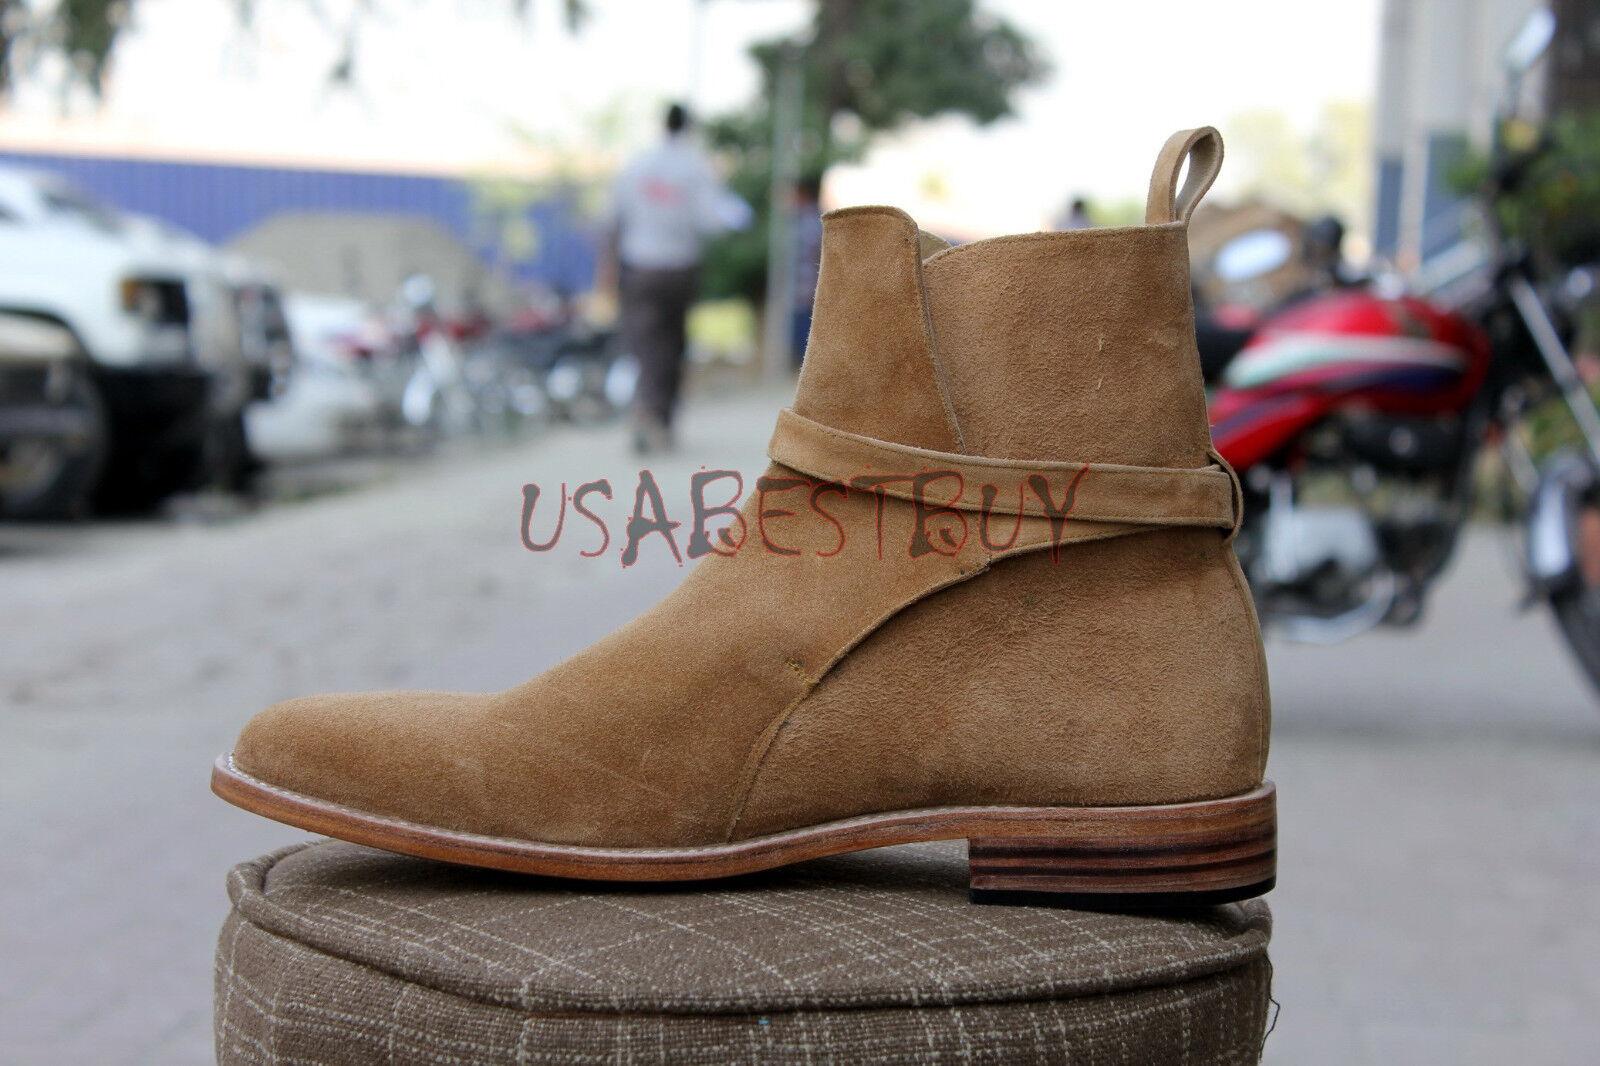 New Handmade Uomo Latest Jodhpur Pelle Suede Ankle High Stivali with Pelle Jodhpur Sole 0be8e3